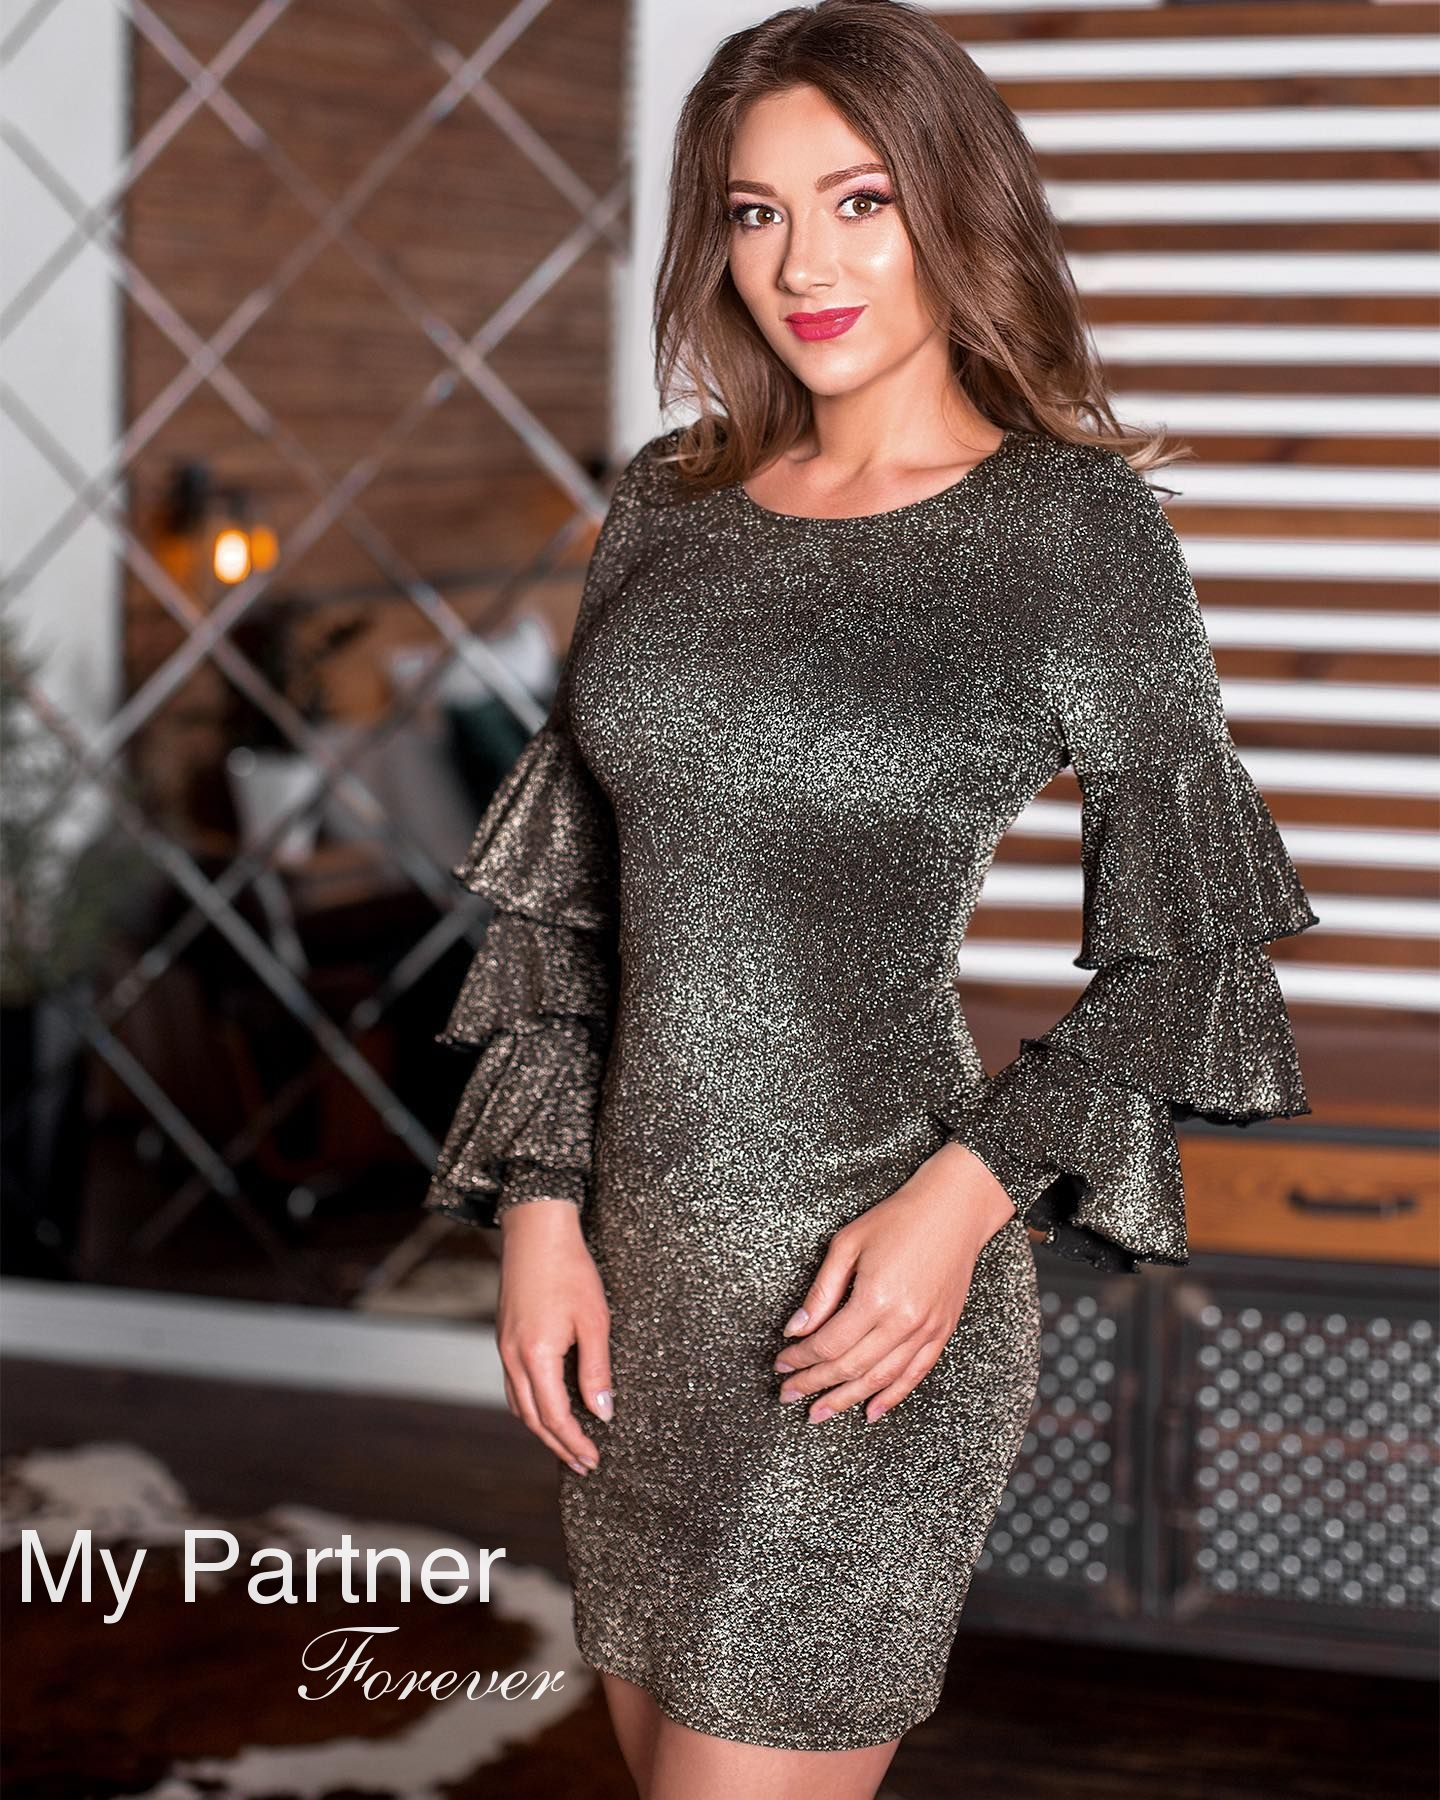 Datingsite to Meet Gorgeous Ukrainian Woman Anna from Kiev, Ukraine